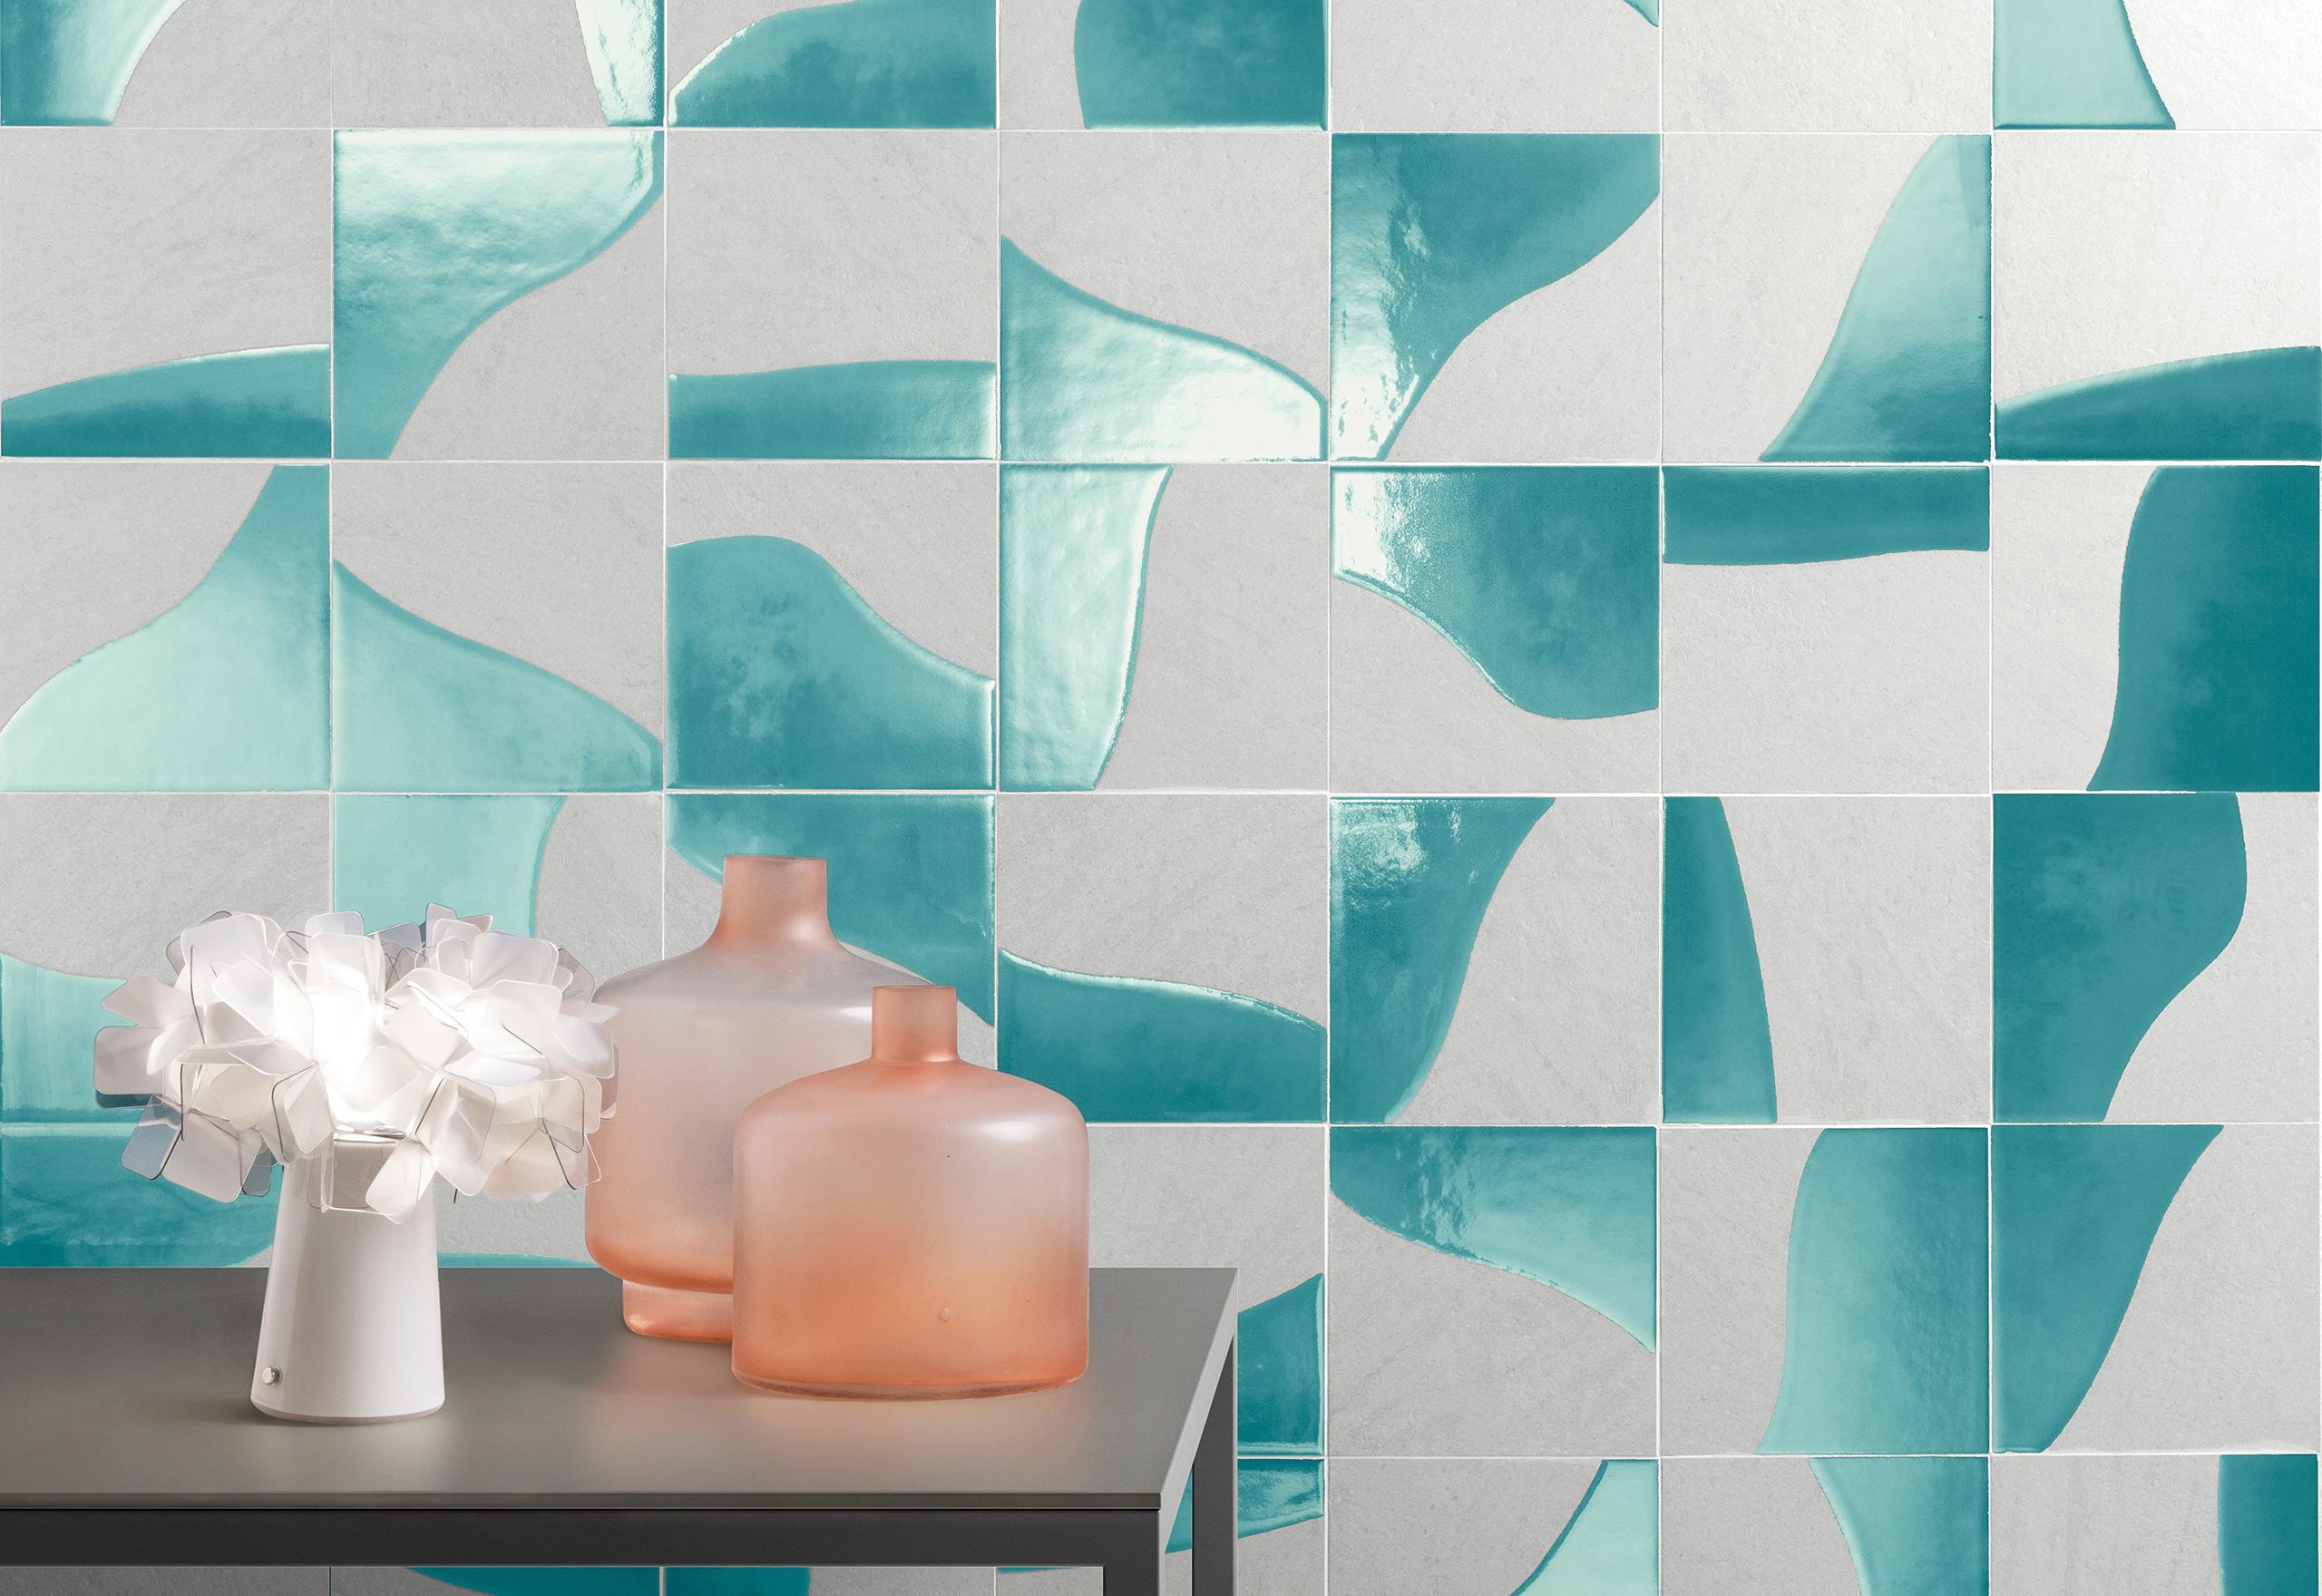 Rendering esterni interni fotorealistici Caesar dettaglio parete